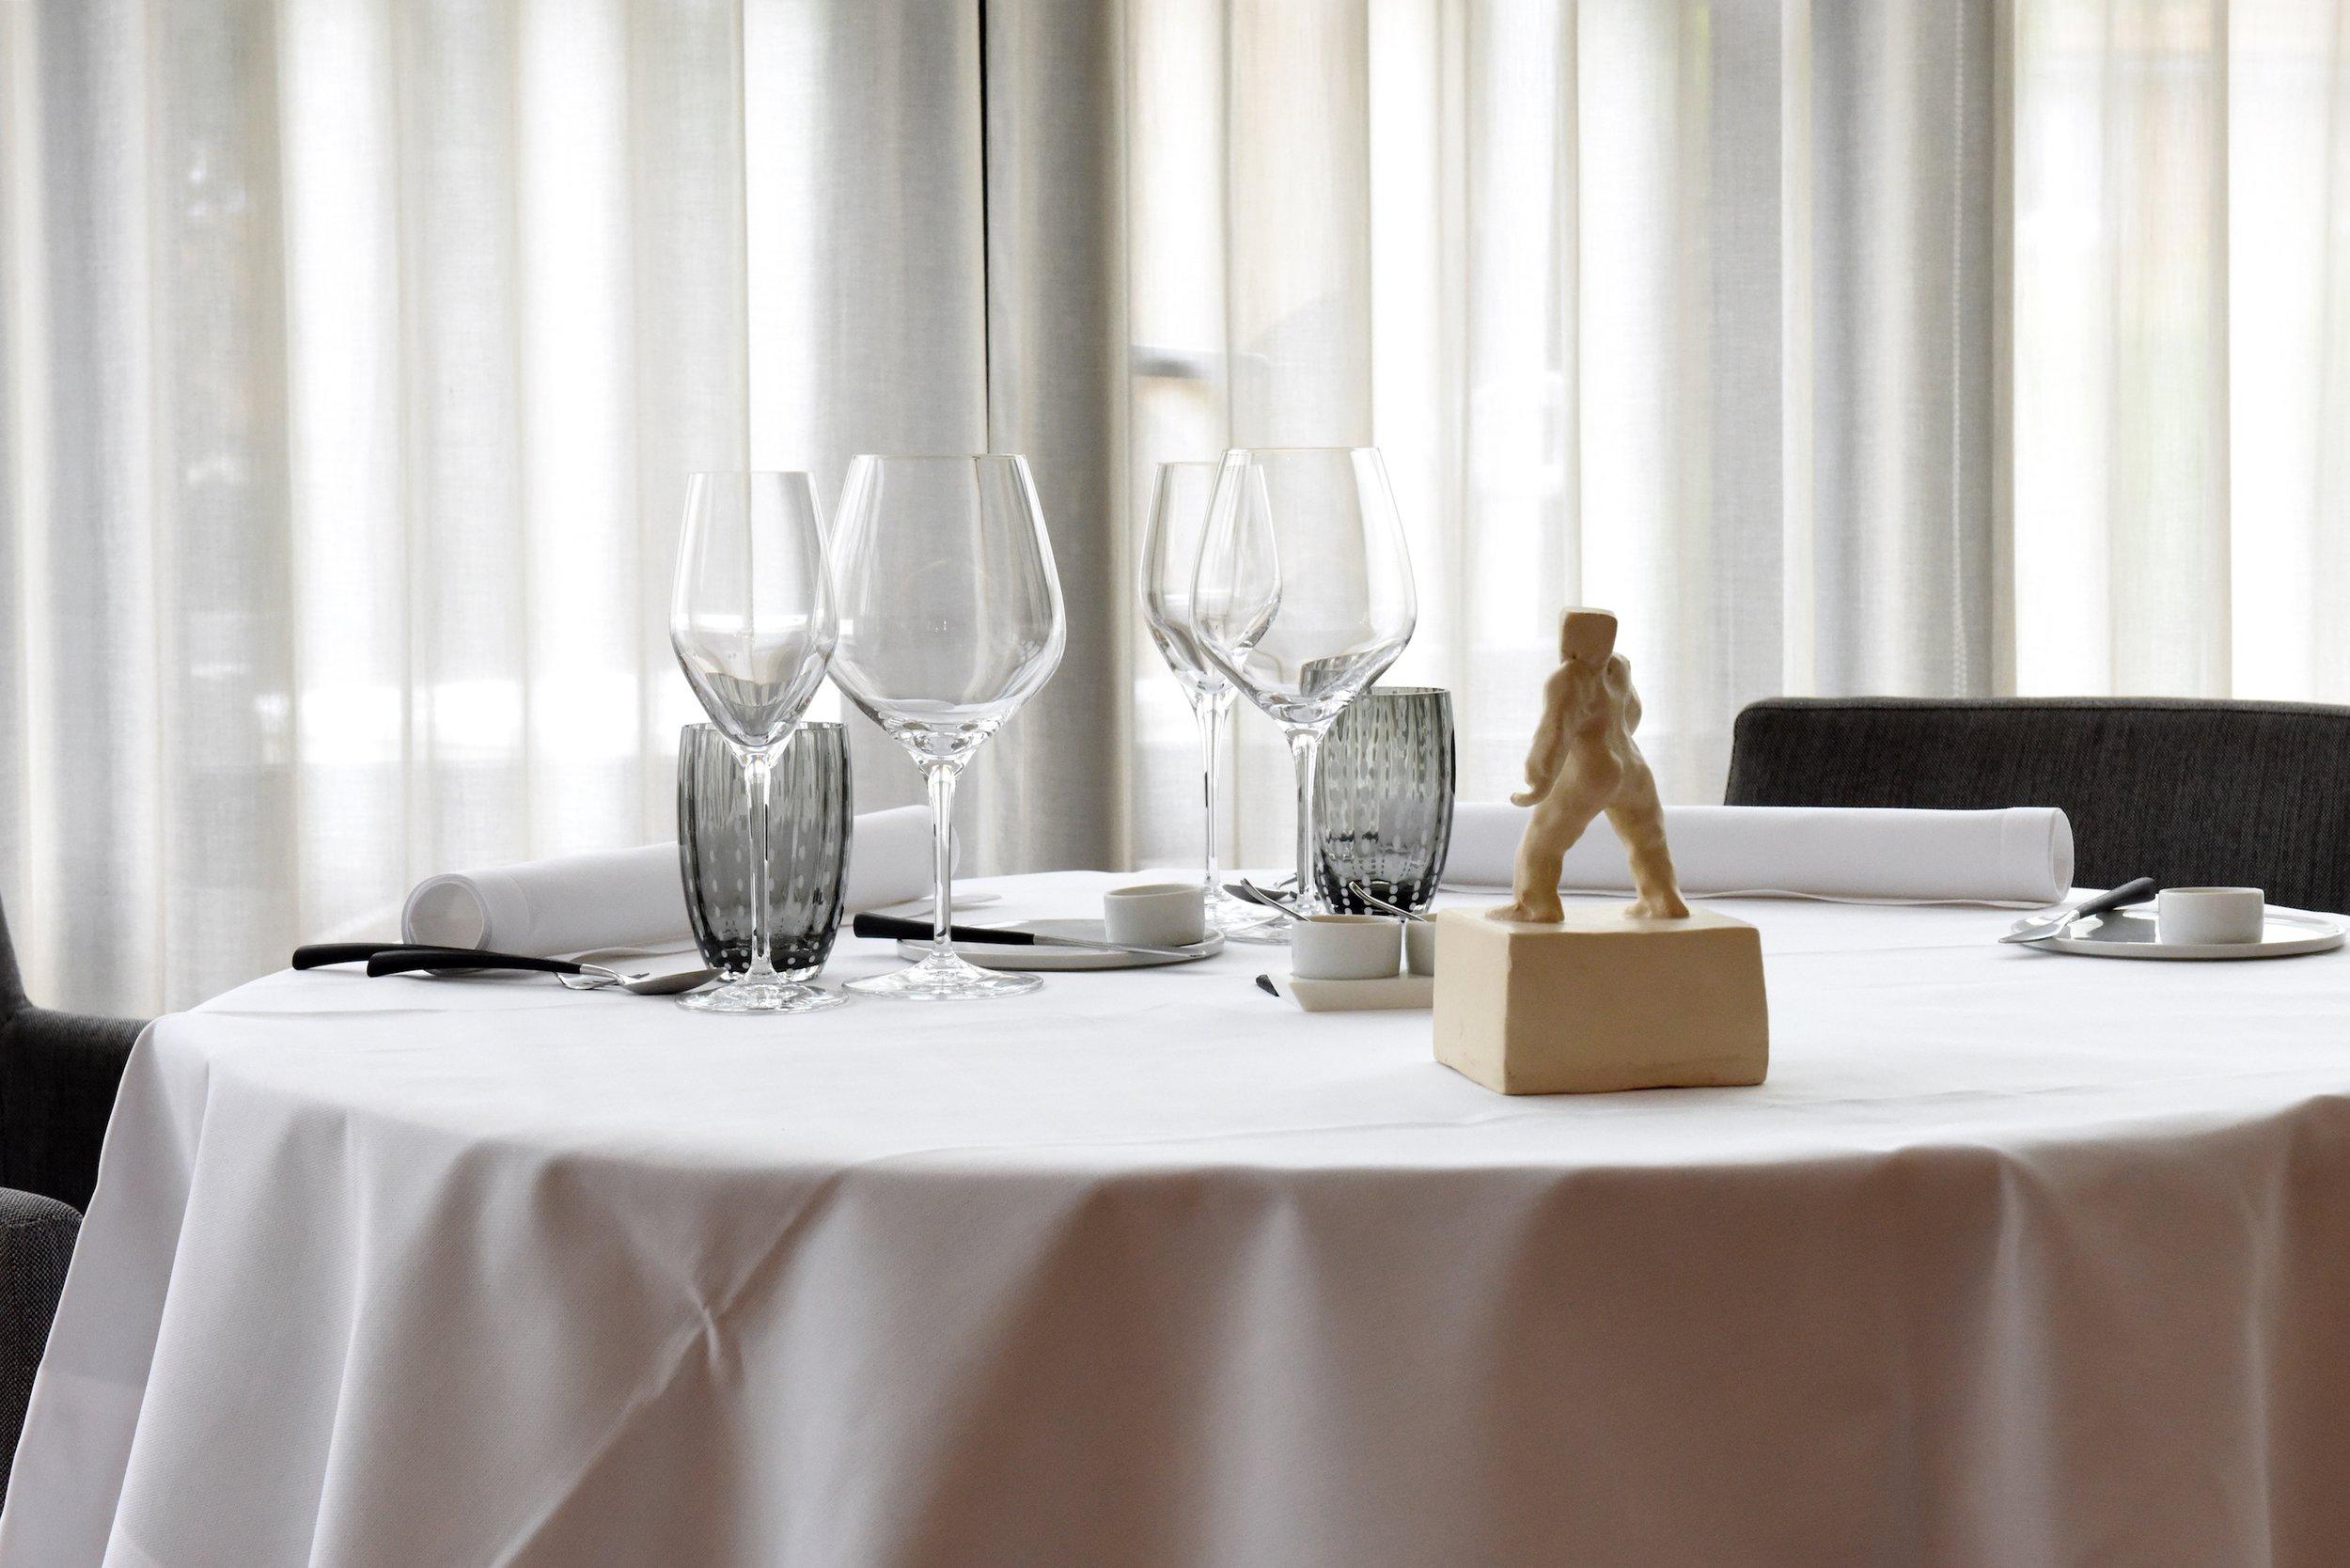 23 arenberg fotograaf restaurant michelin bart albrecht tablefever everlee Egenhoven 0008.jpg